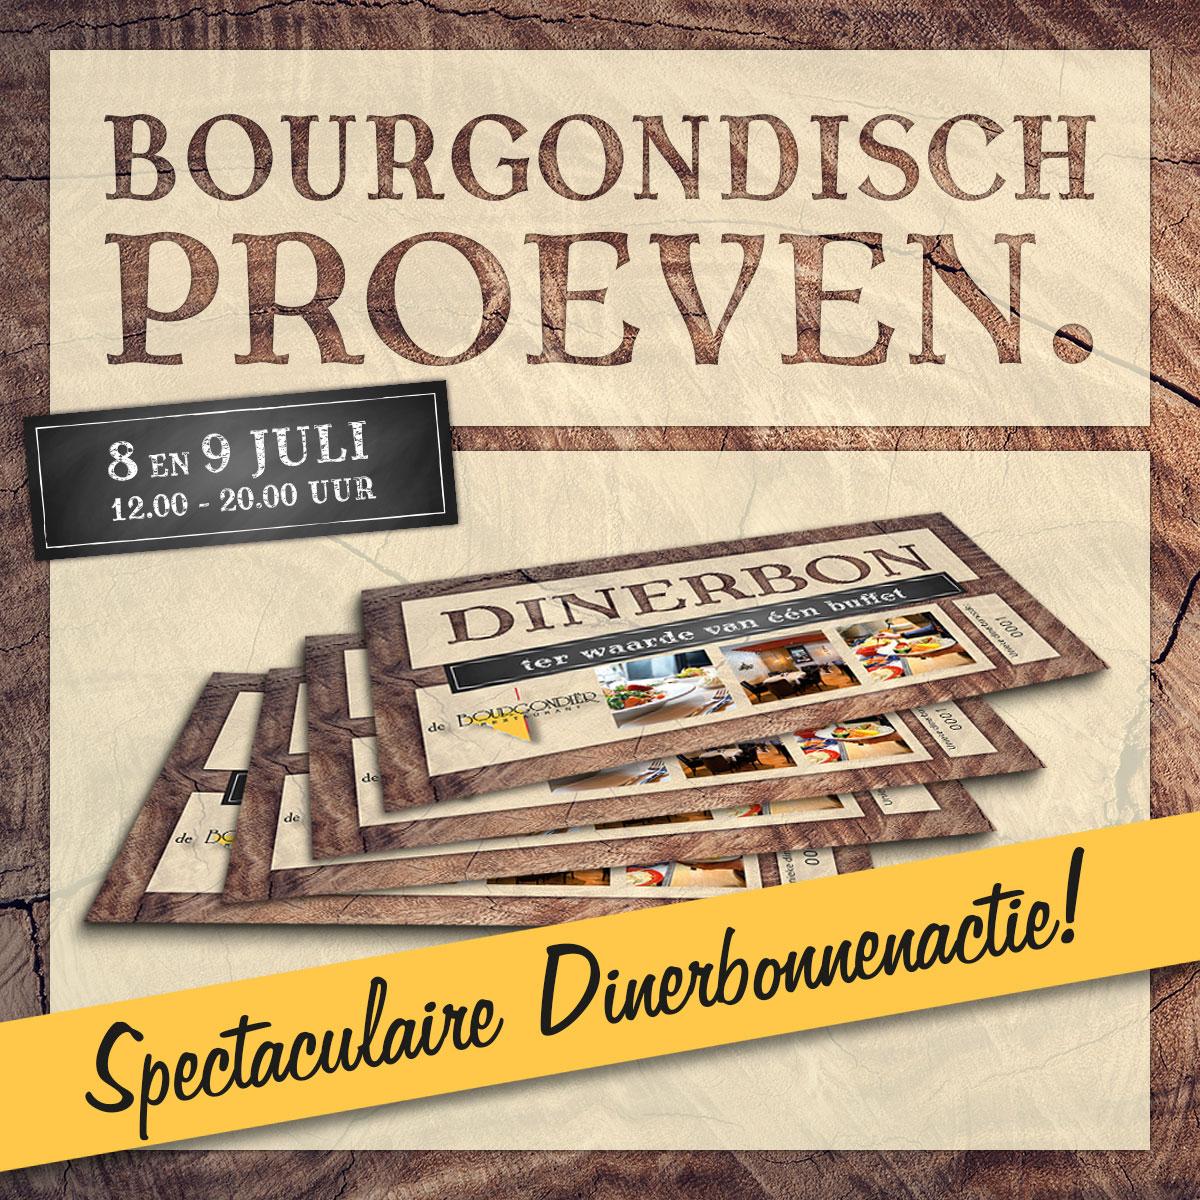 De Bourgondiër – Bourgondisch Proeven. – Facebookbericht – Spectaculaire-Dinerbonnenactie